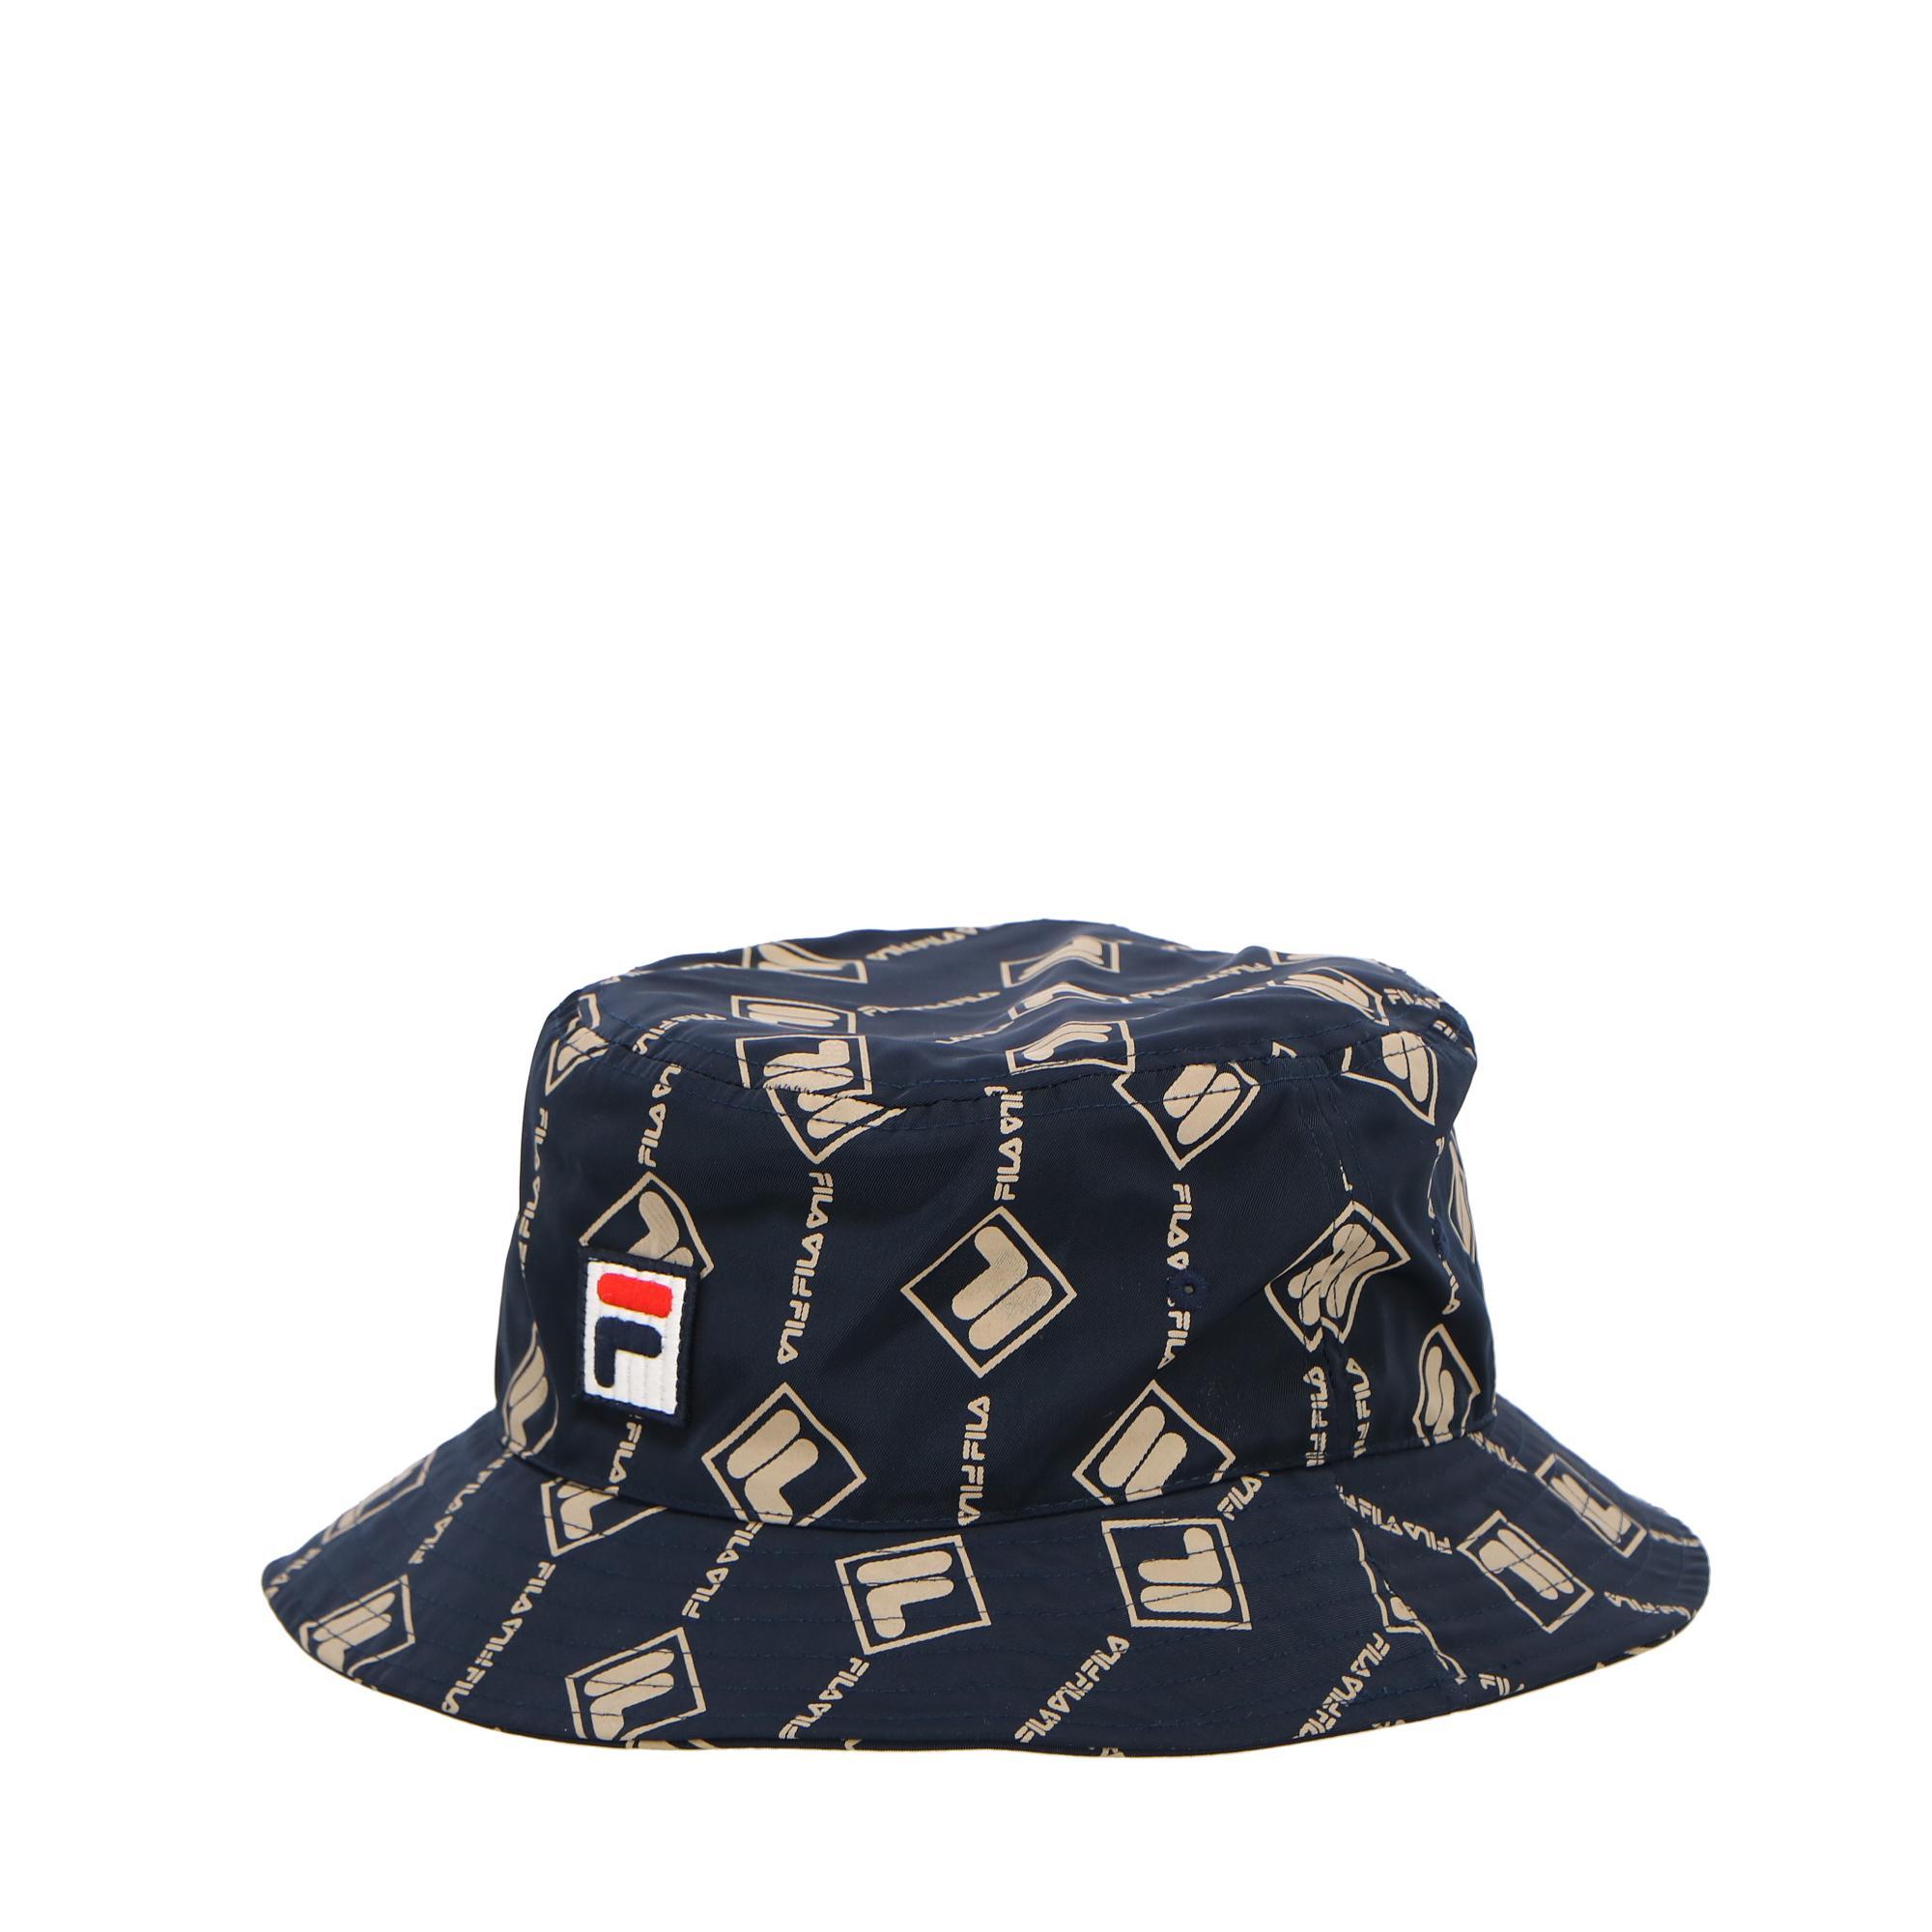 Fila Bucket Hat Aop Black iris irish cream